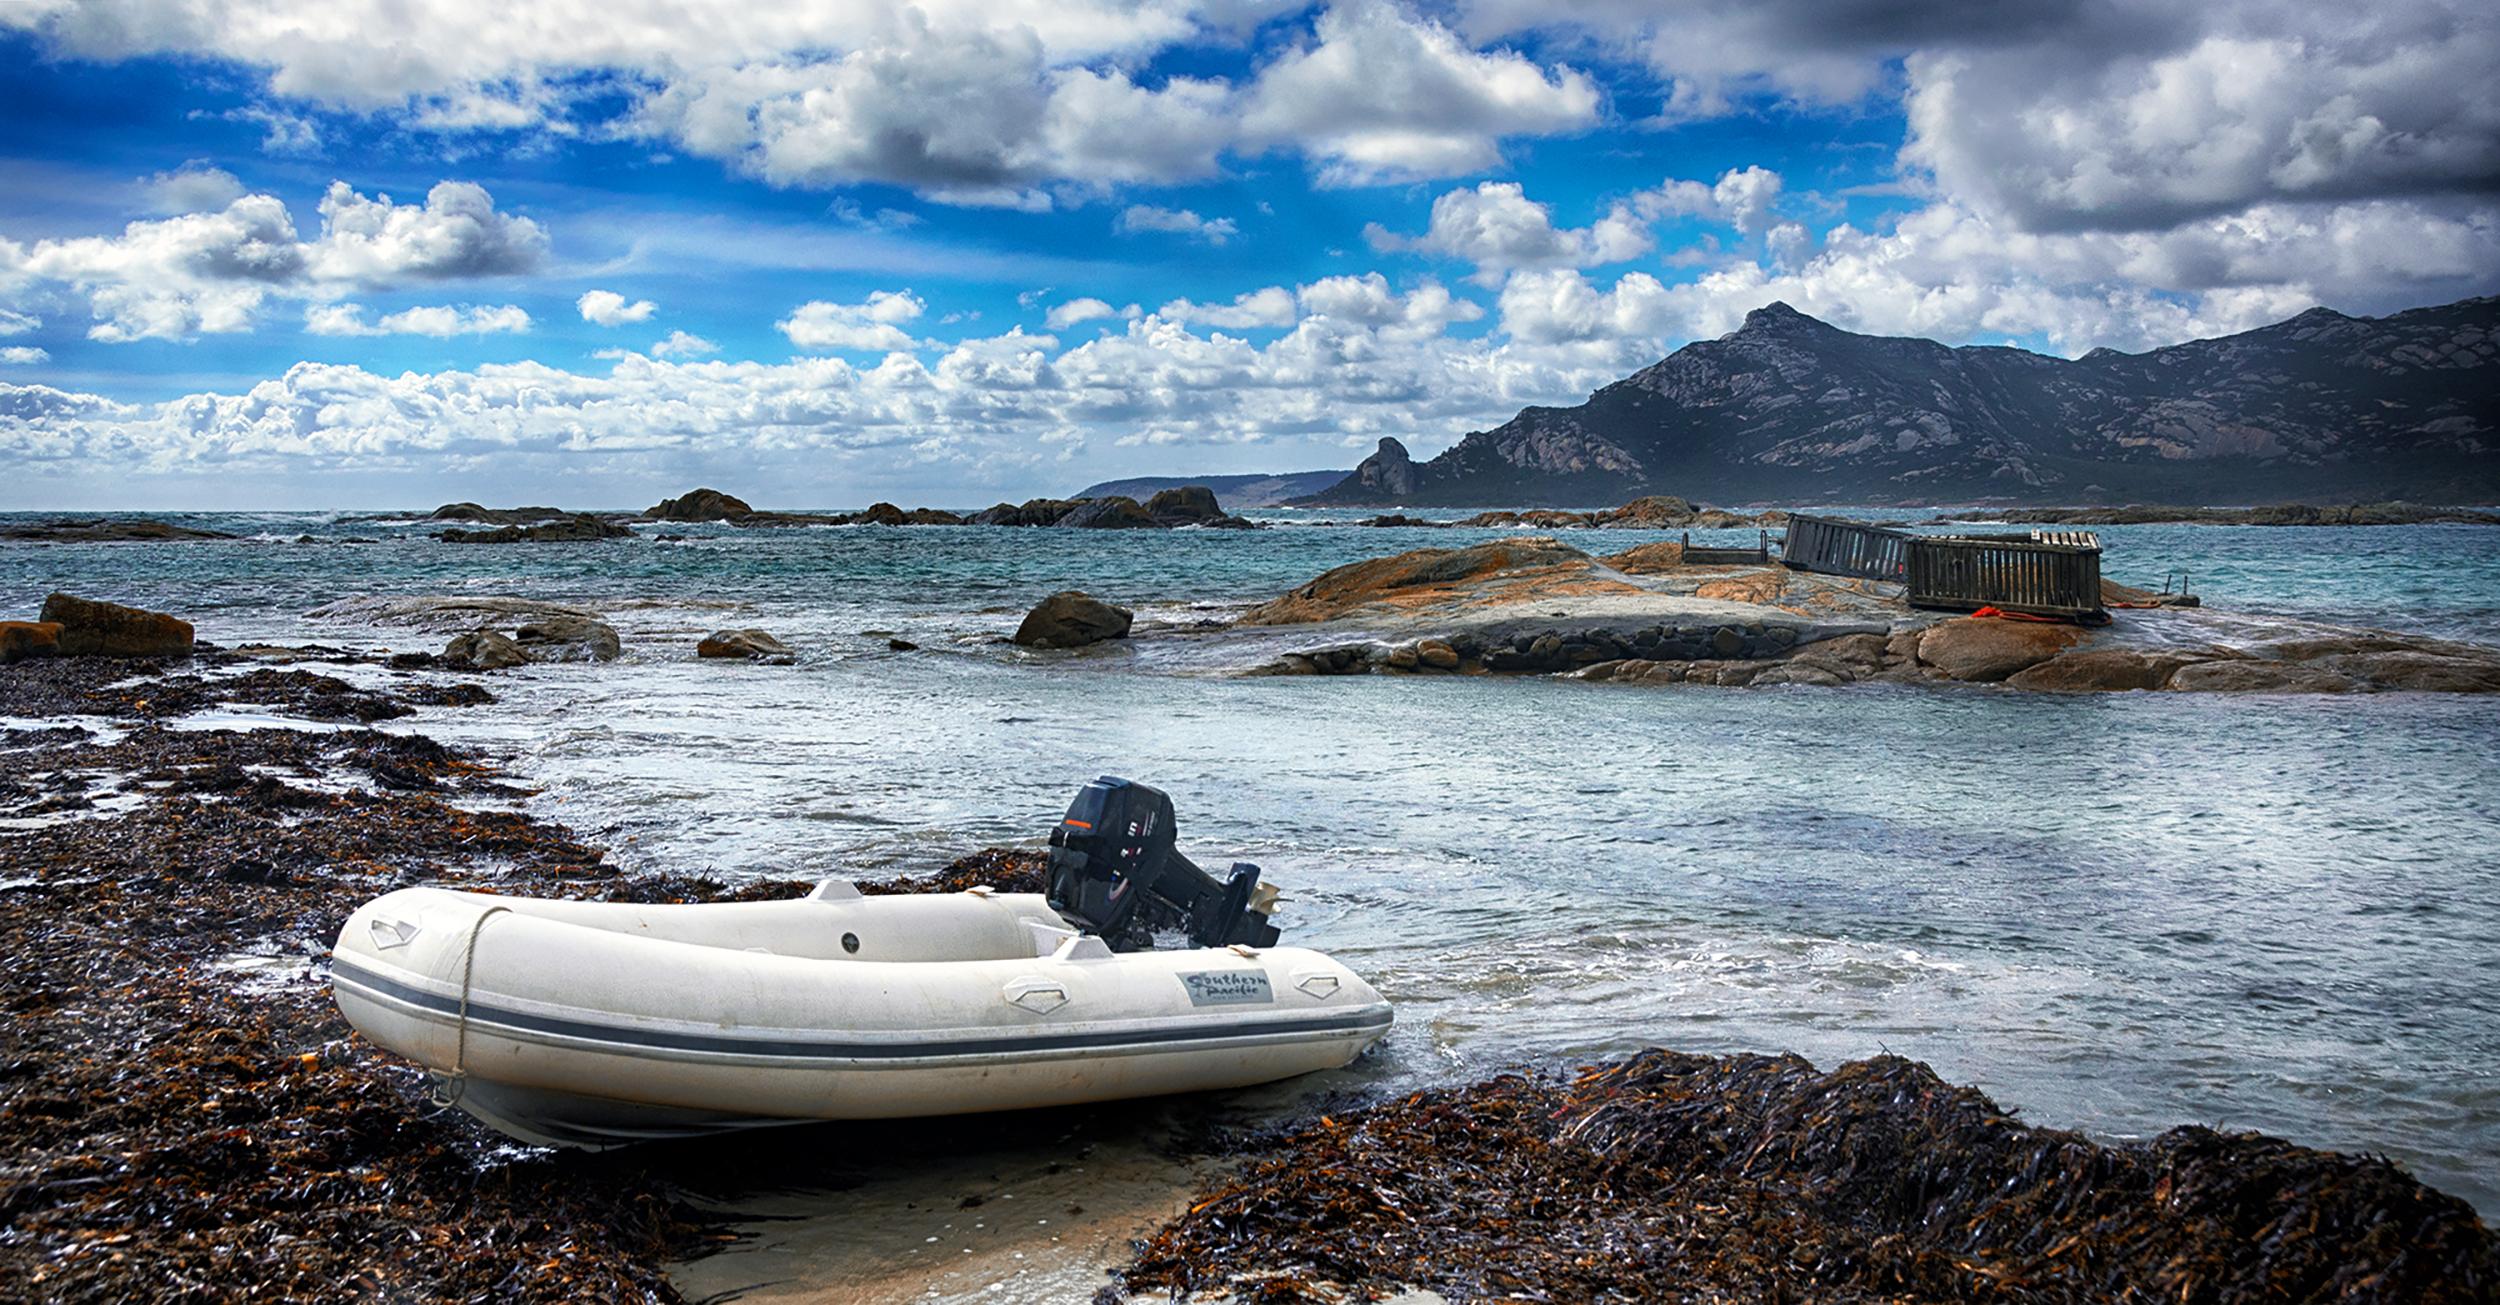 DSC_0199_HDR-2-Prepare for Boating.jpg